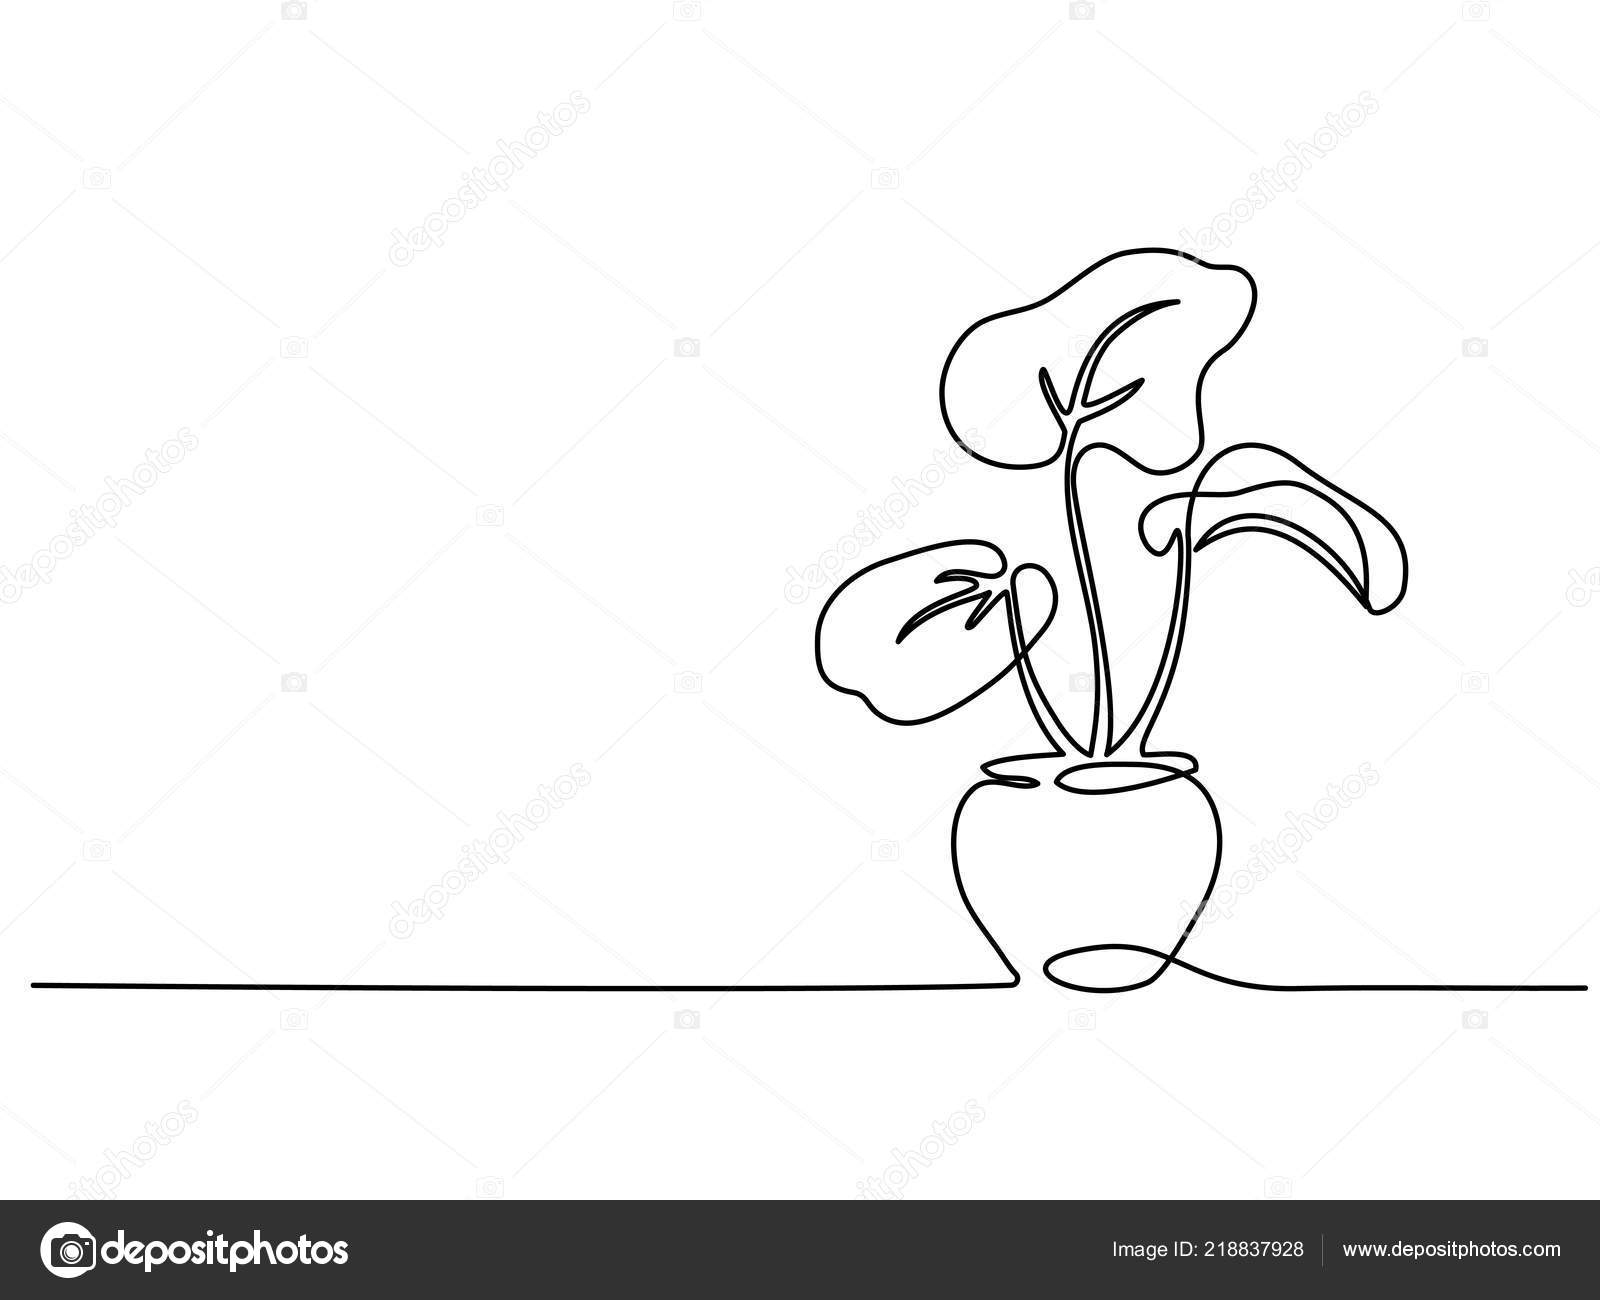 Pokojova Rostlina V Hrnci Kontinualni Jeden Radek Vykresu Stock